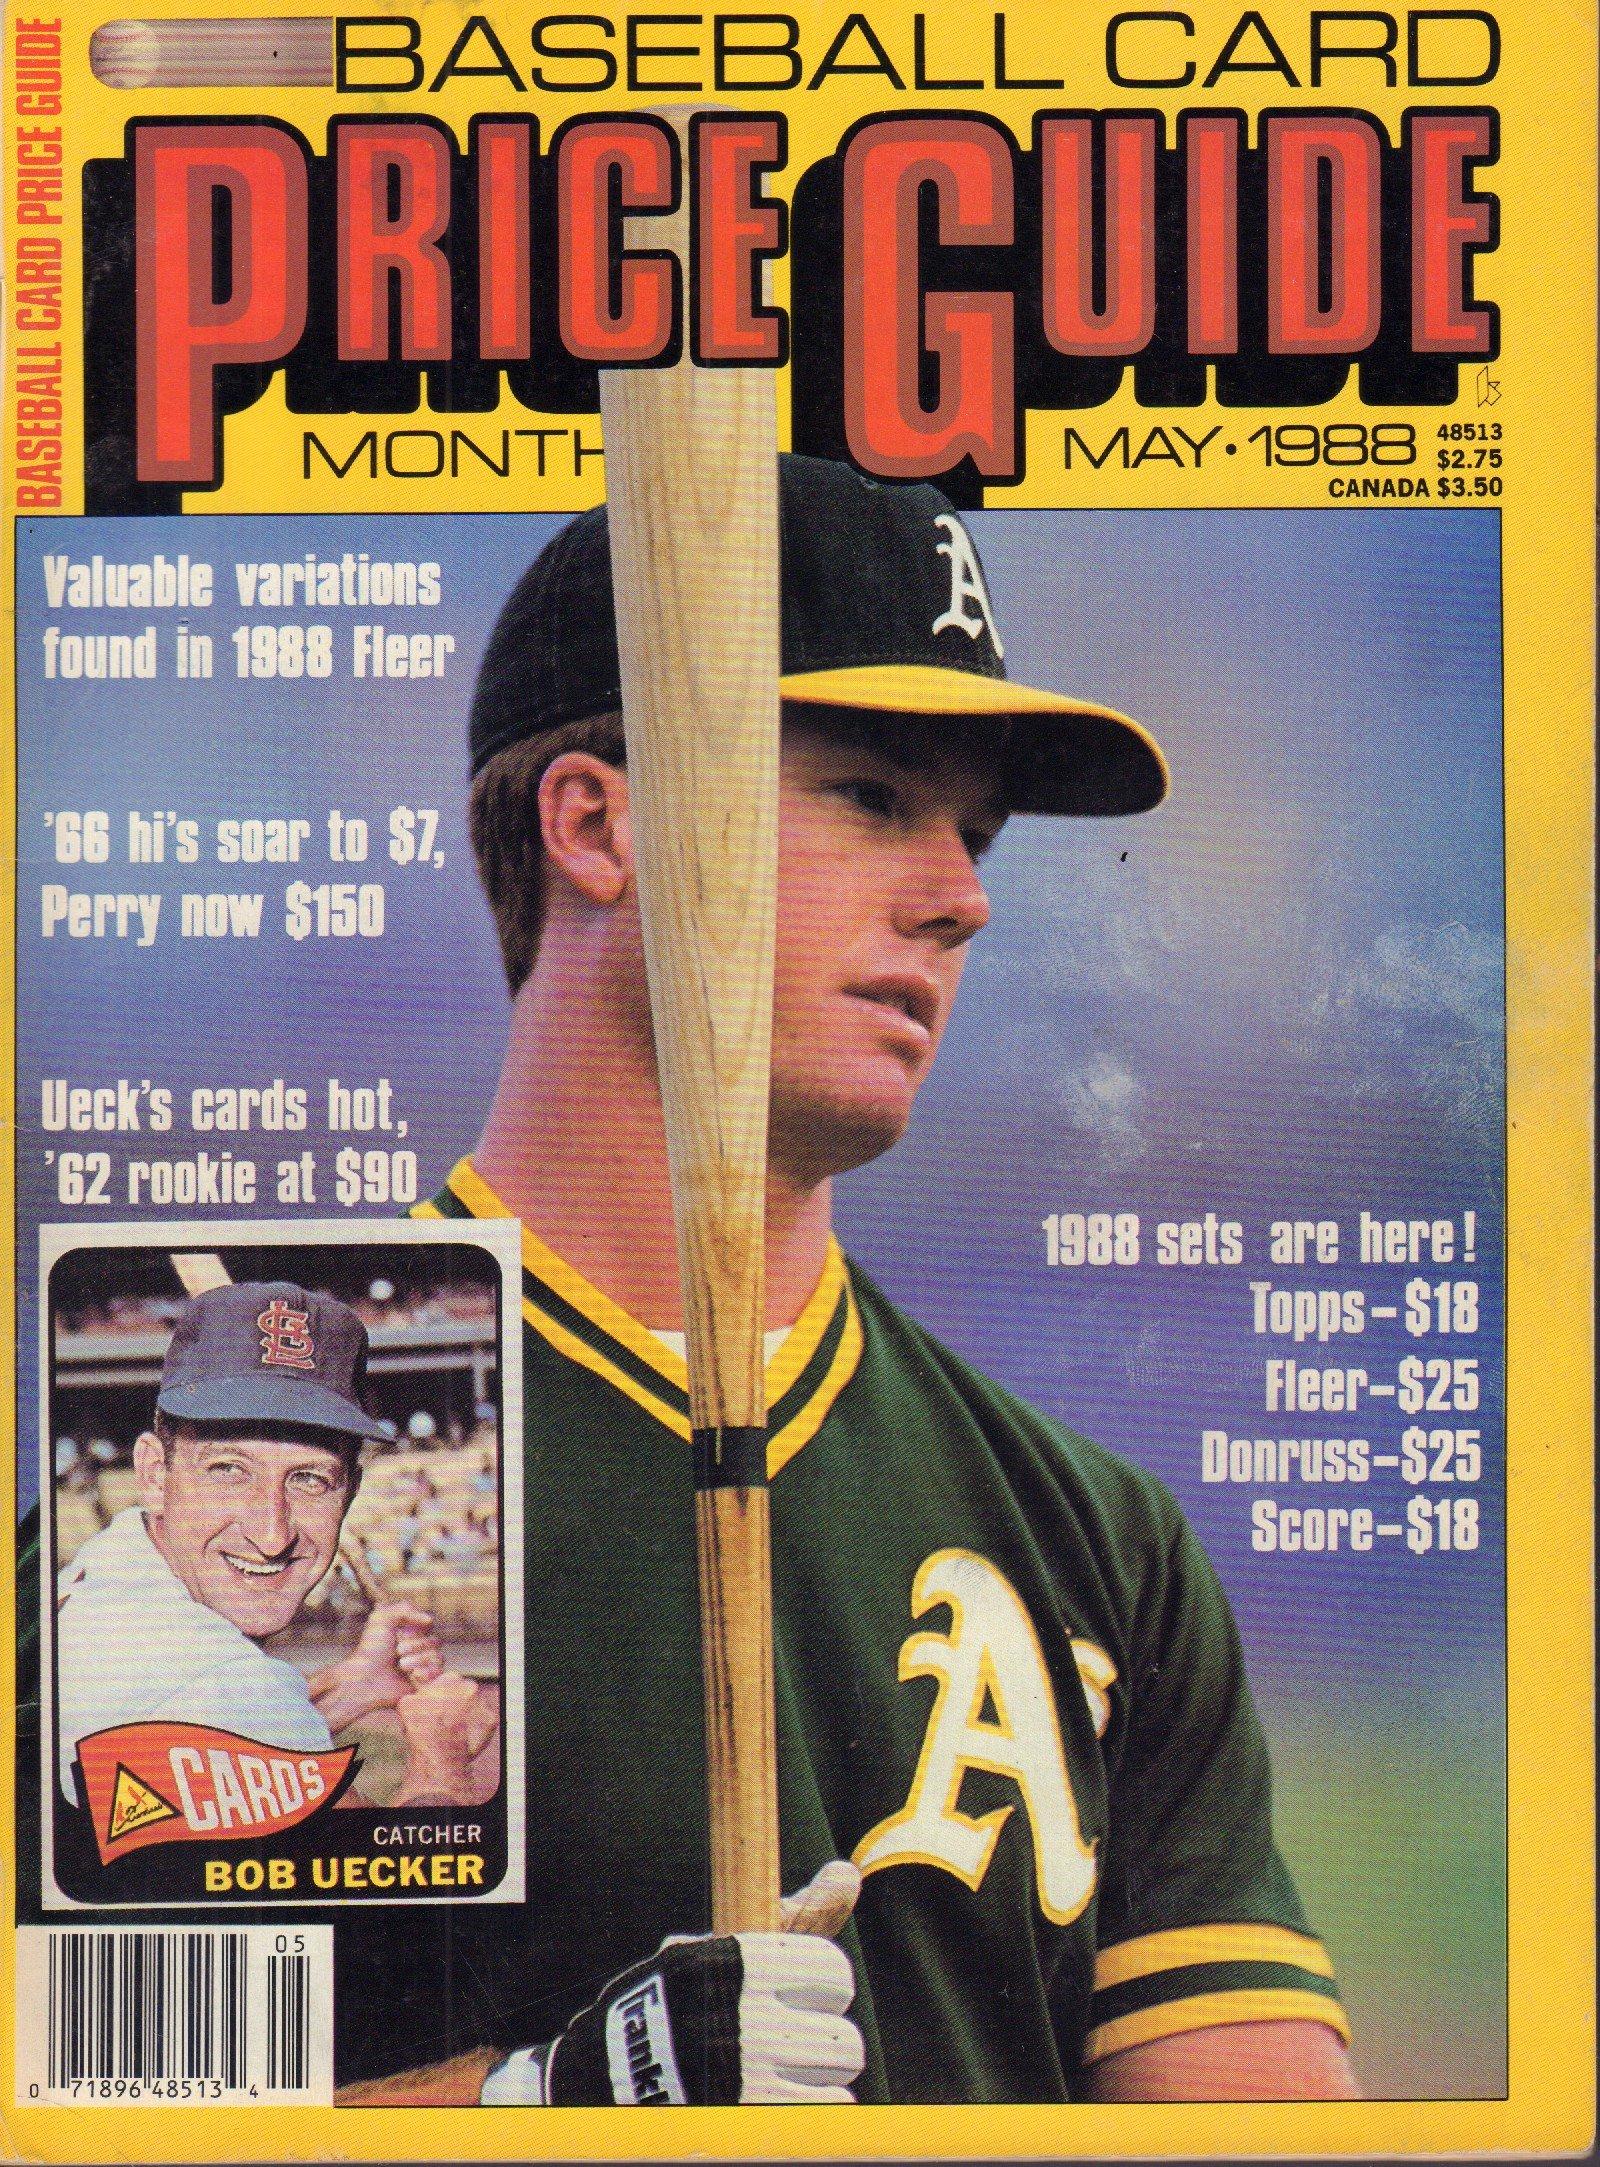 Baseball Card Price Guide May 1988 Bob Uecker Kp Amazon